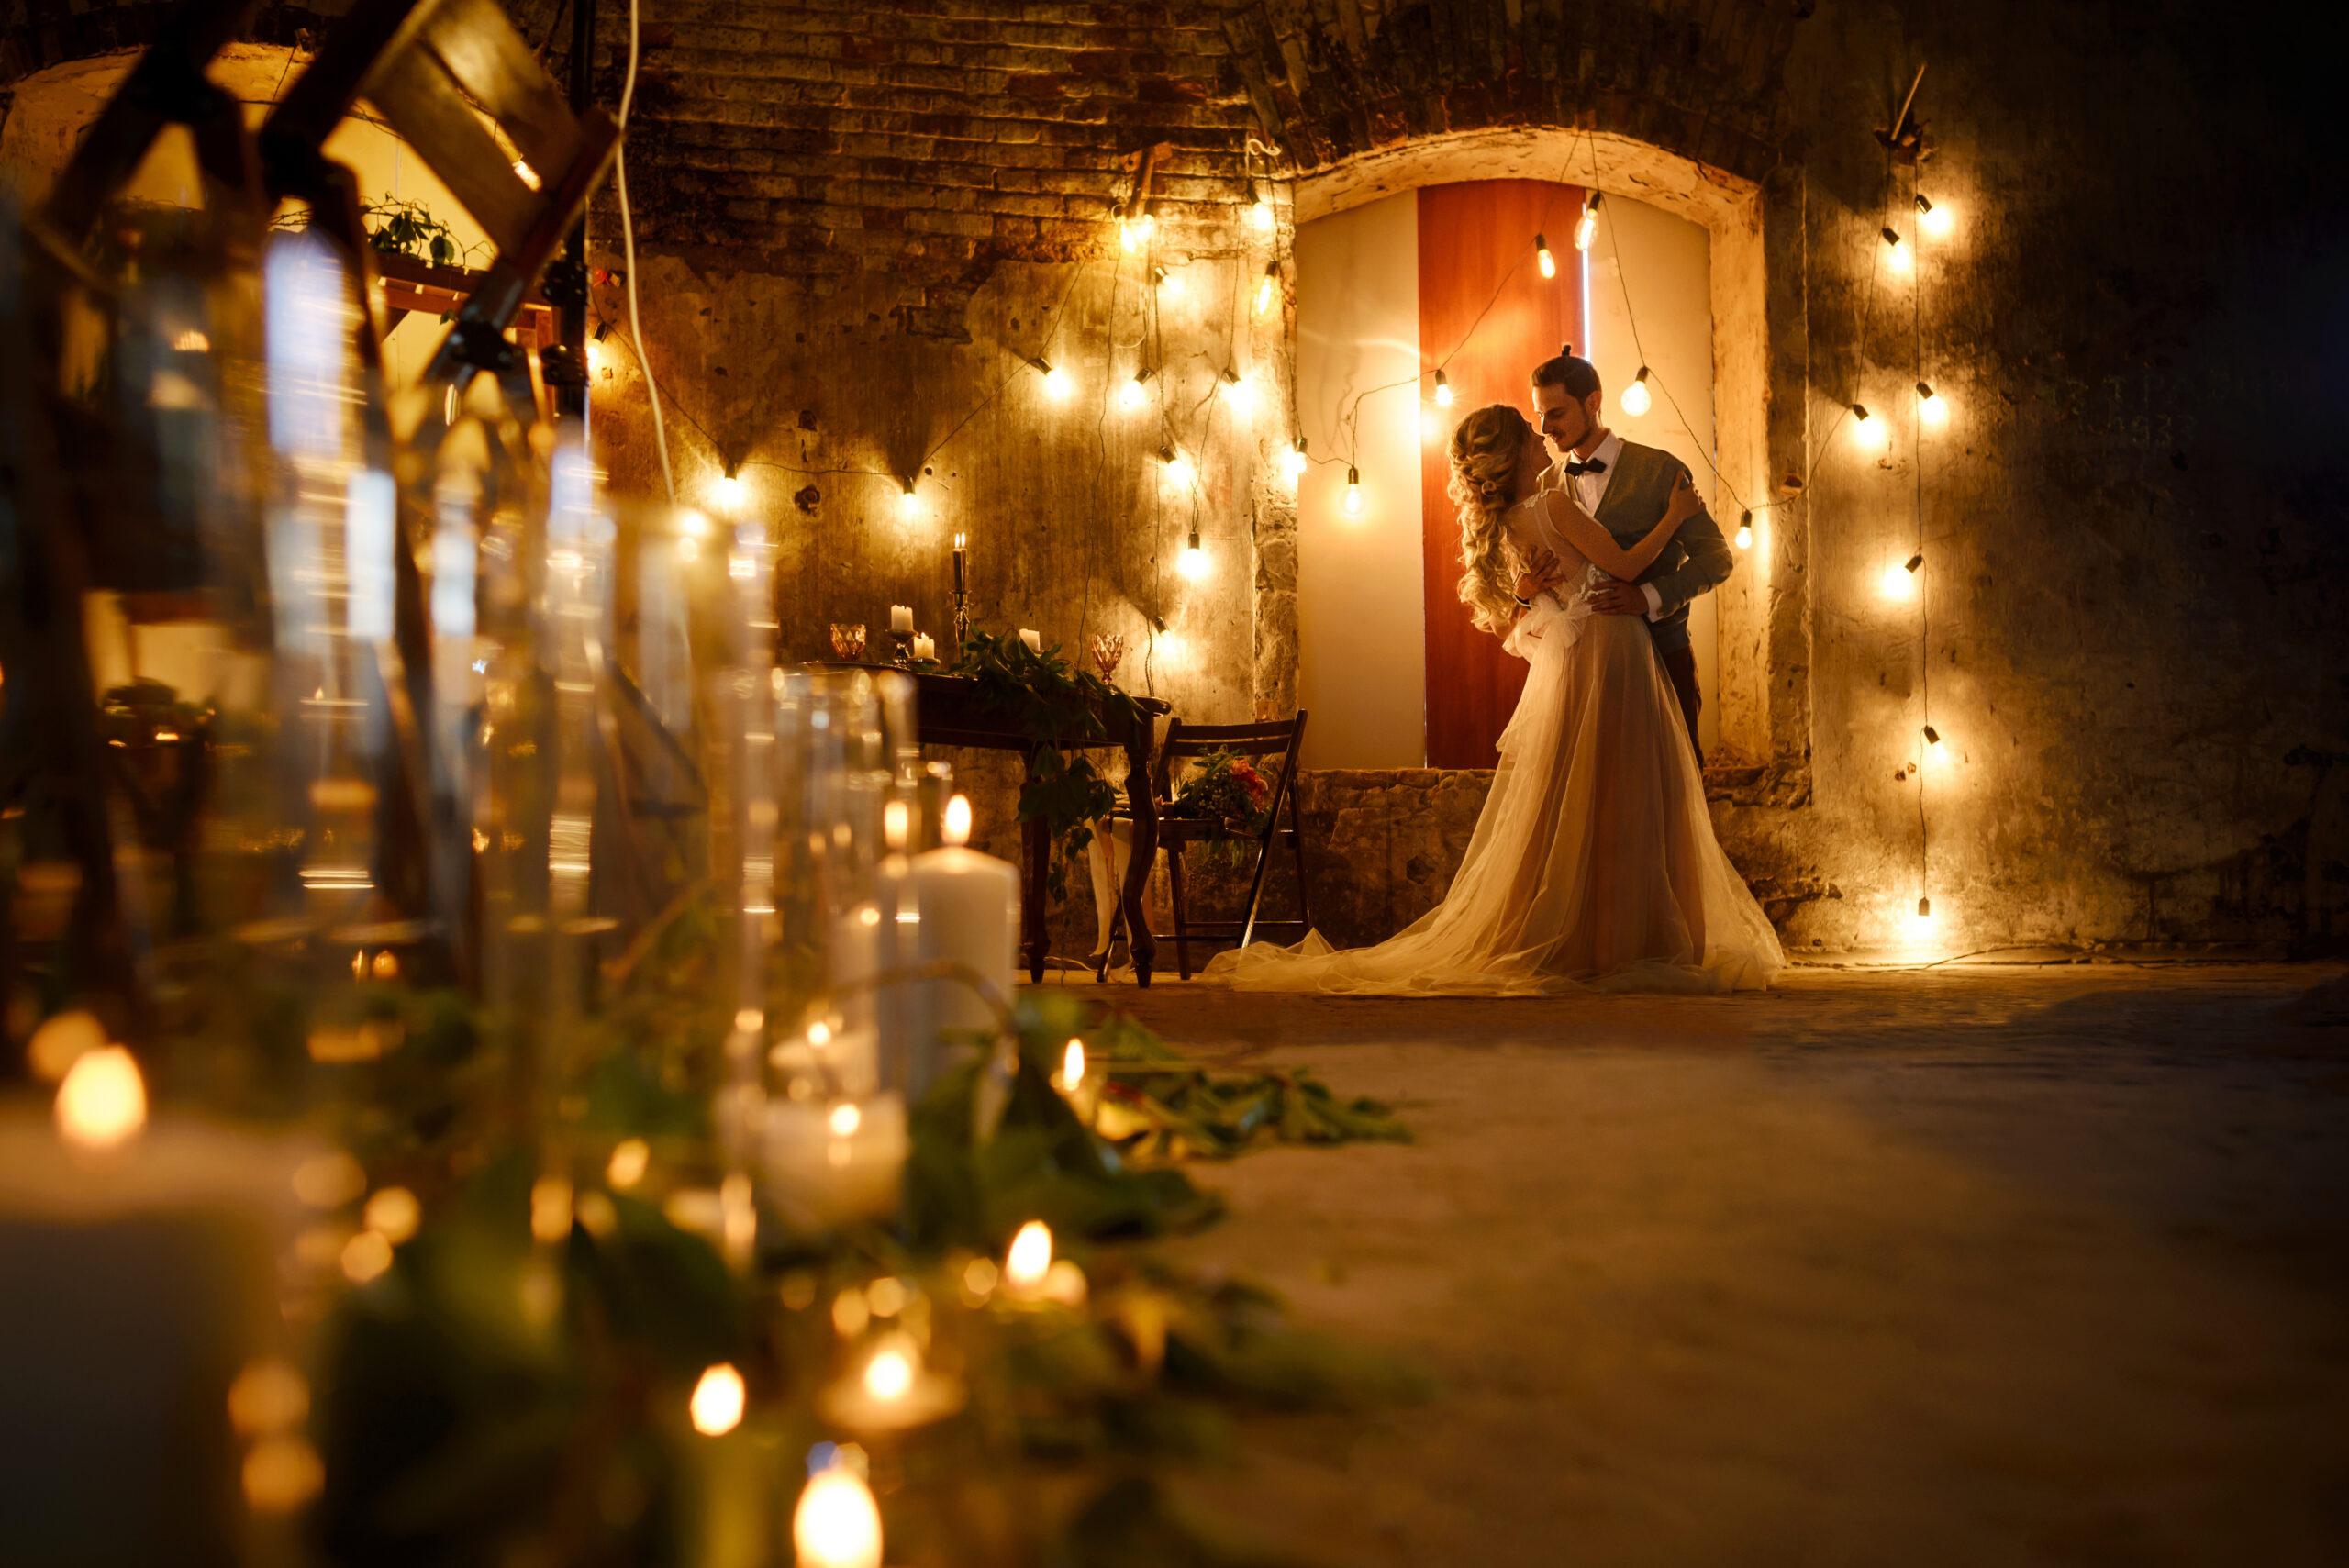 Stylish hipster wedding couple in romantic loft decorations at night